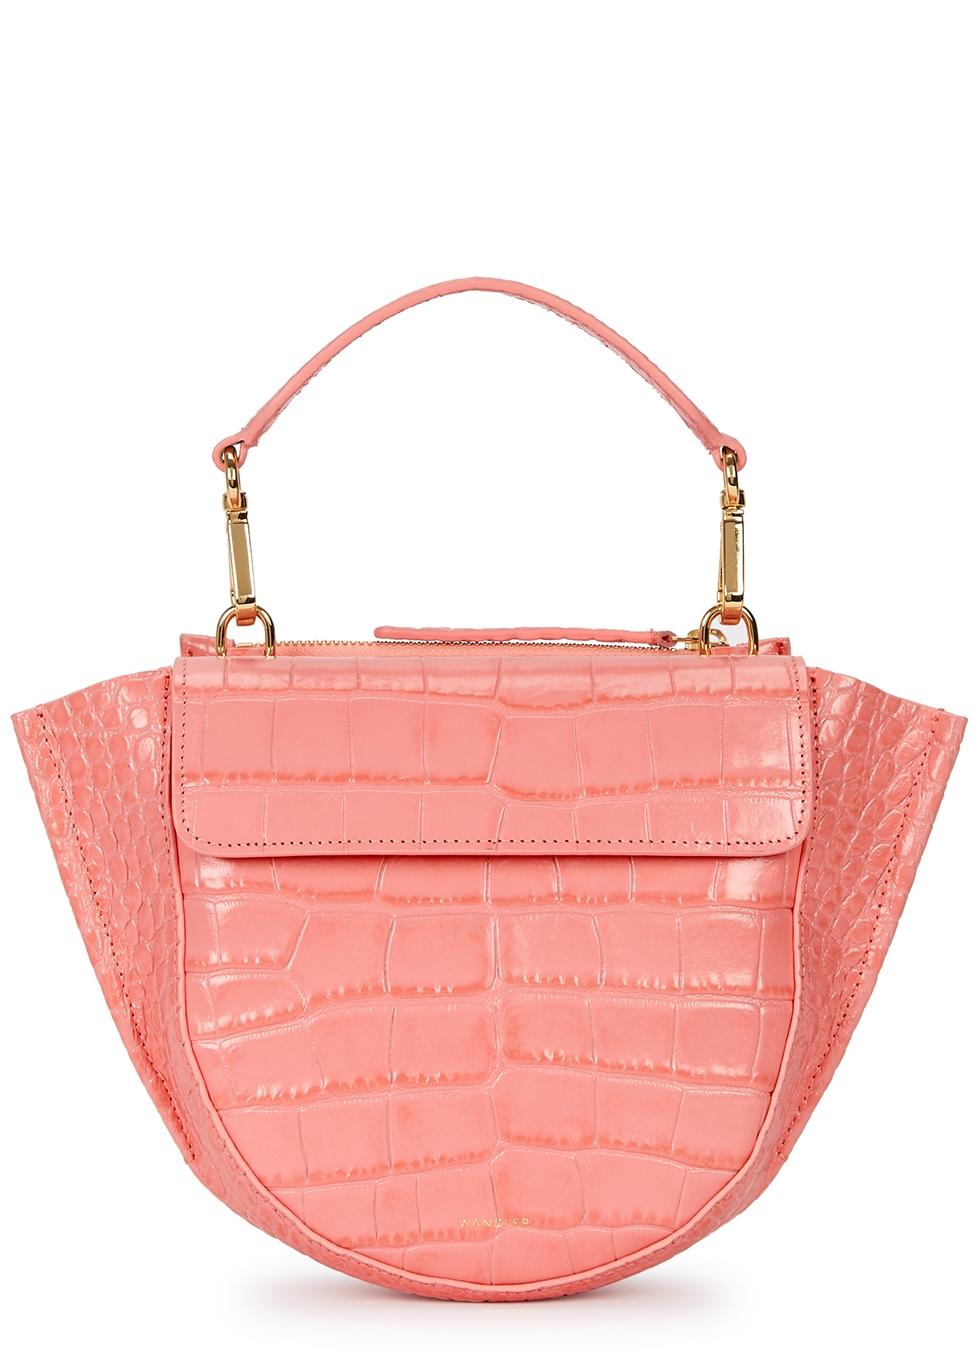 Hortensia mini leather top handle bag